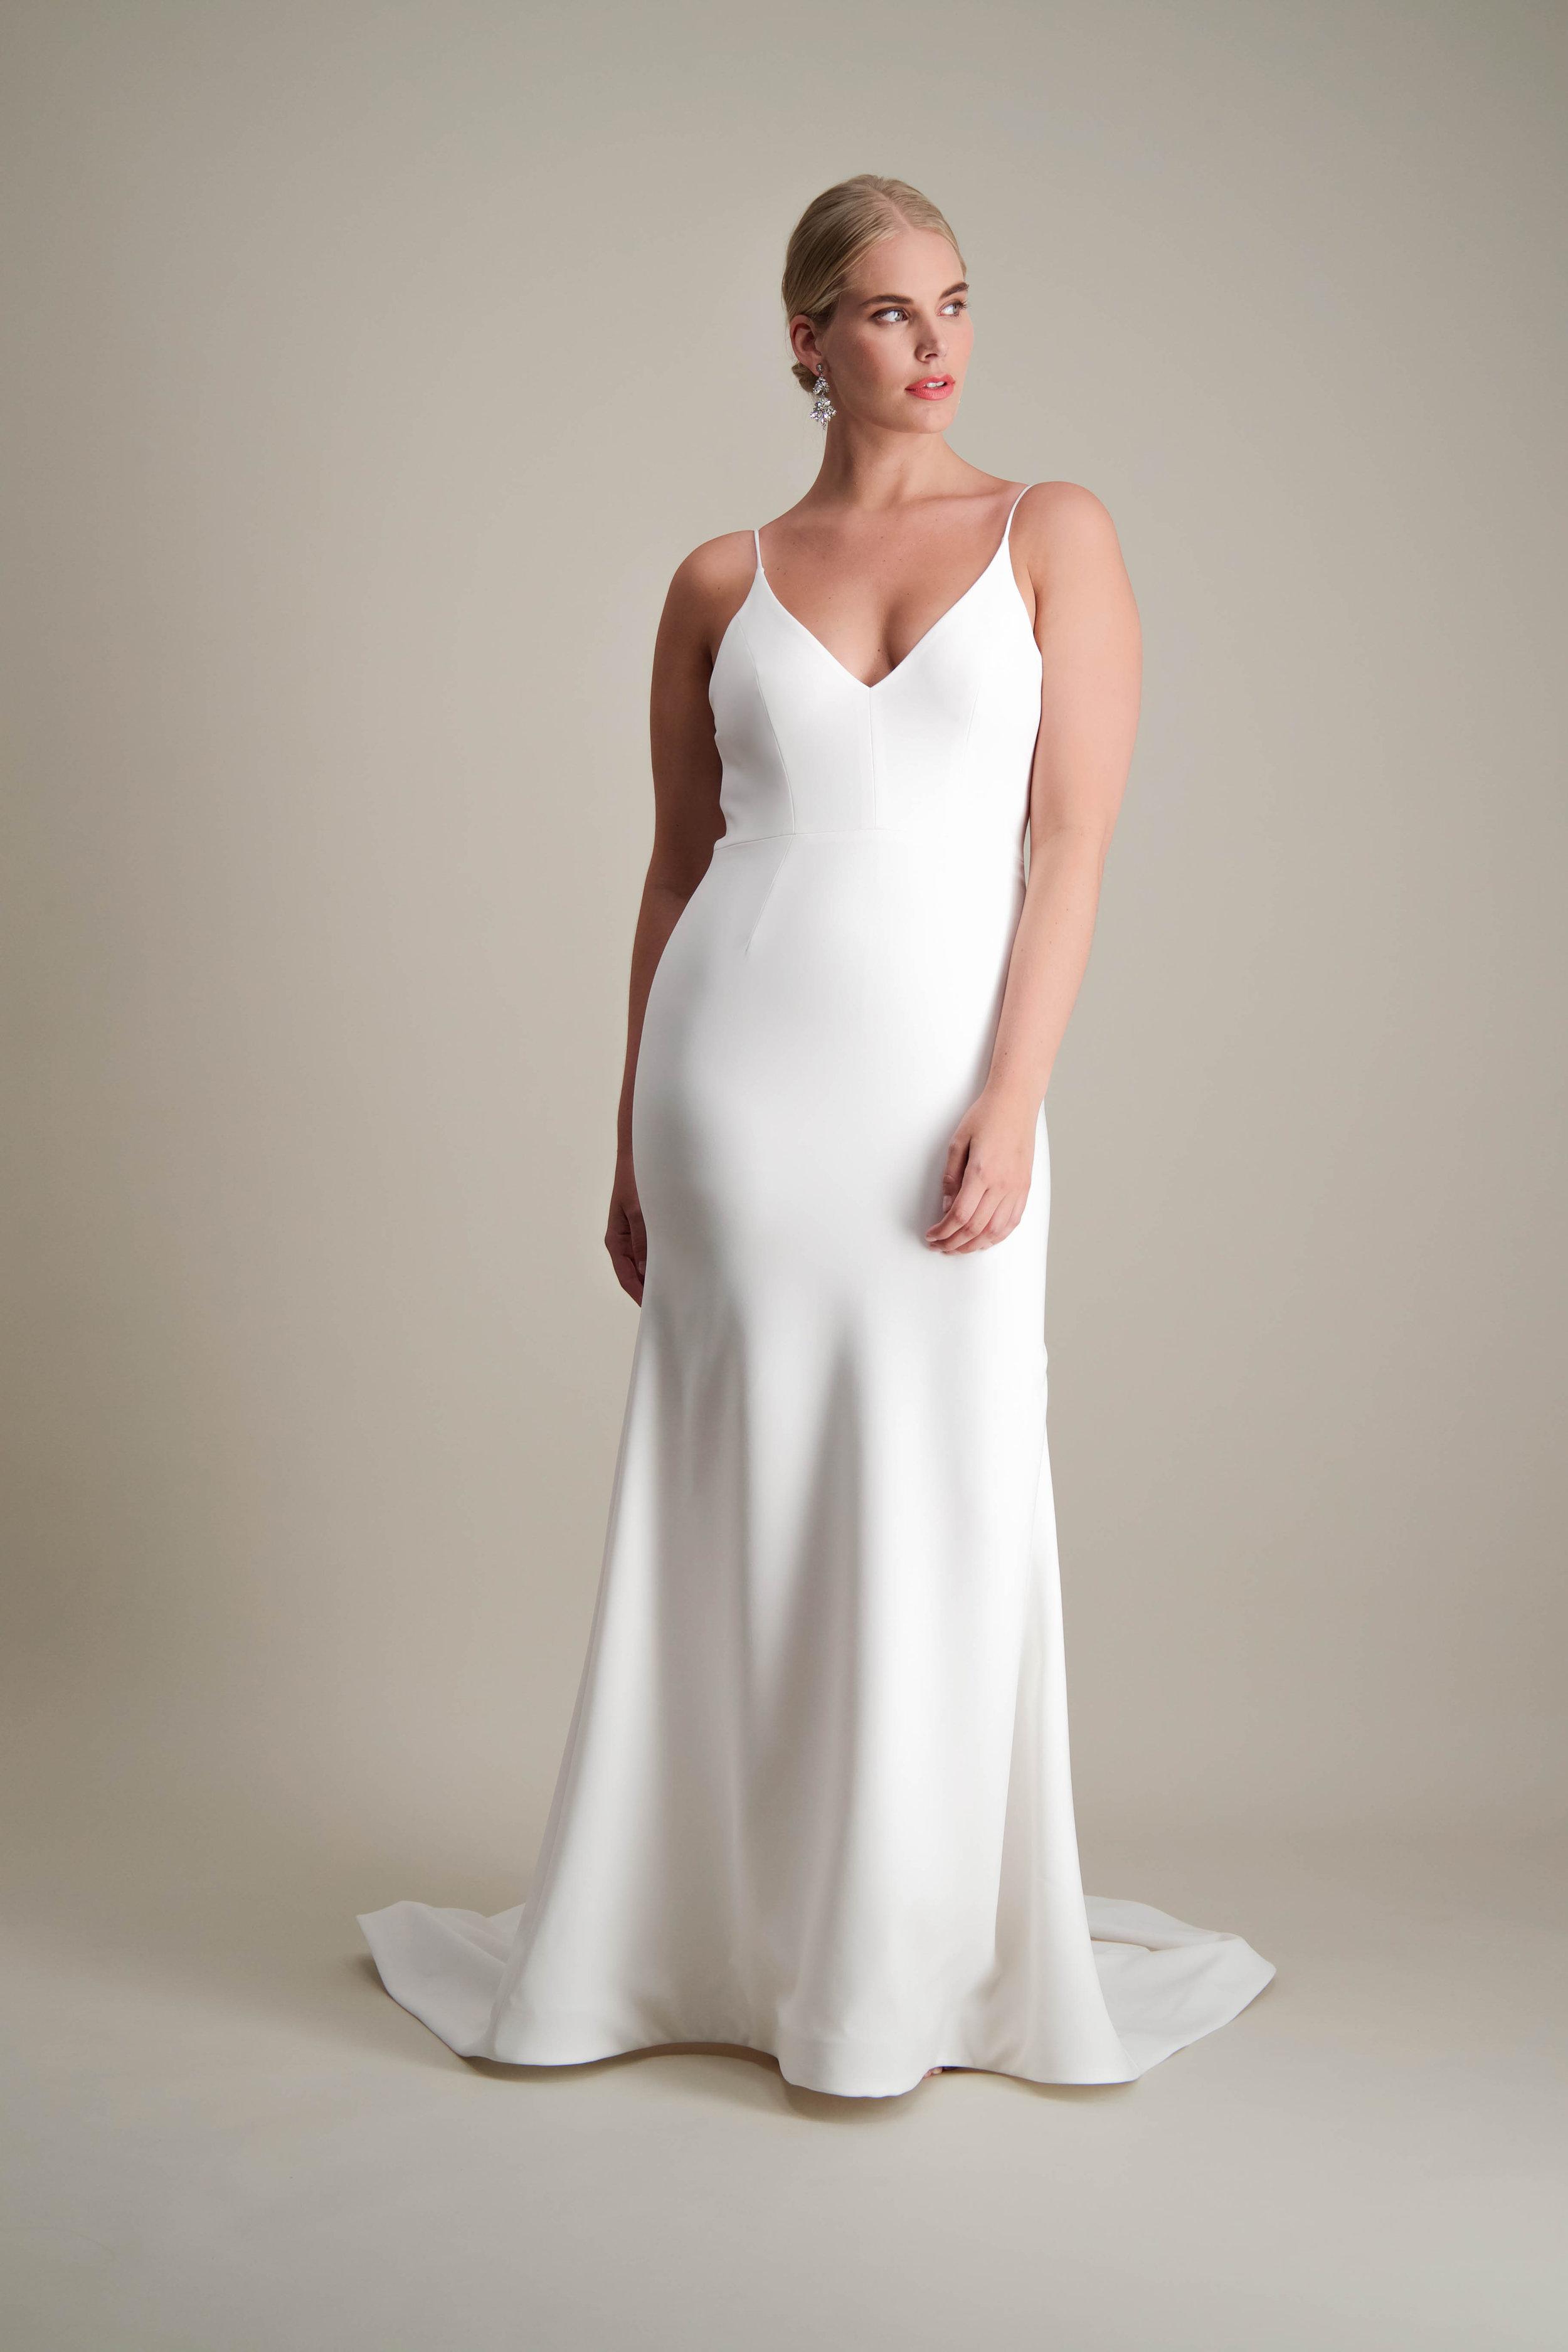 Islet gown fitted modern sleek wedding dress 2.jpg